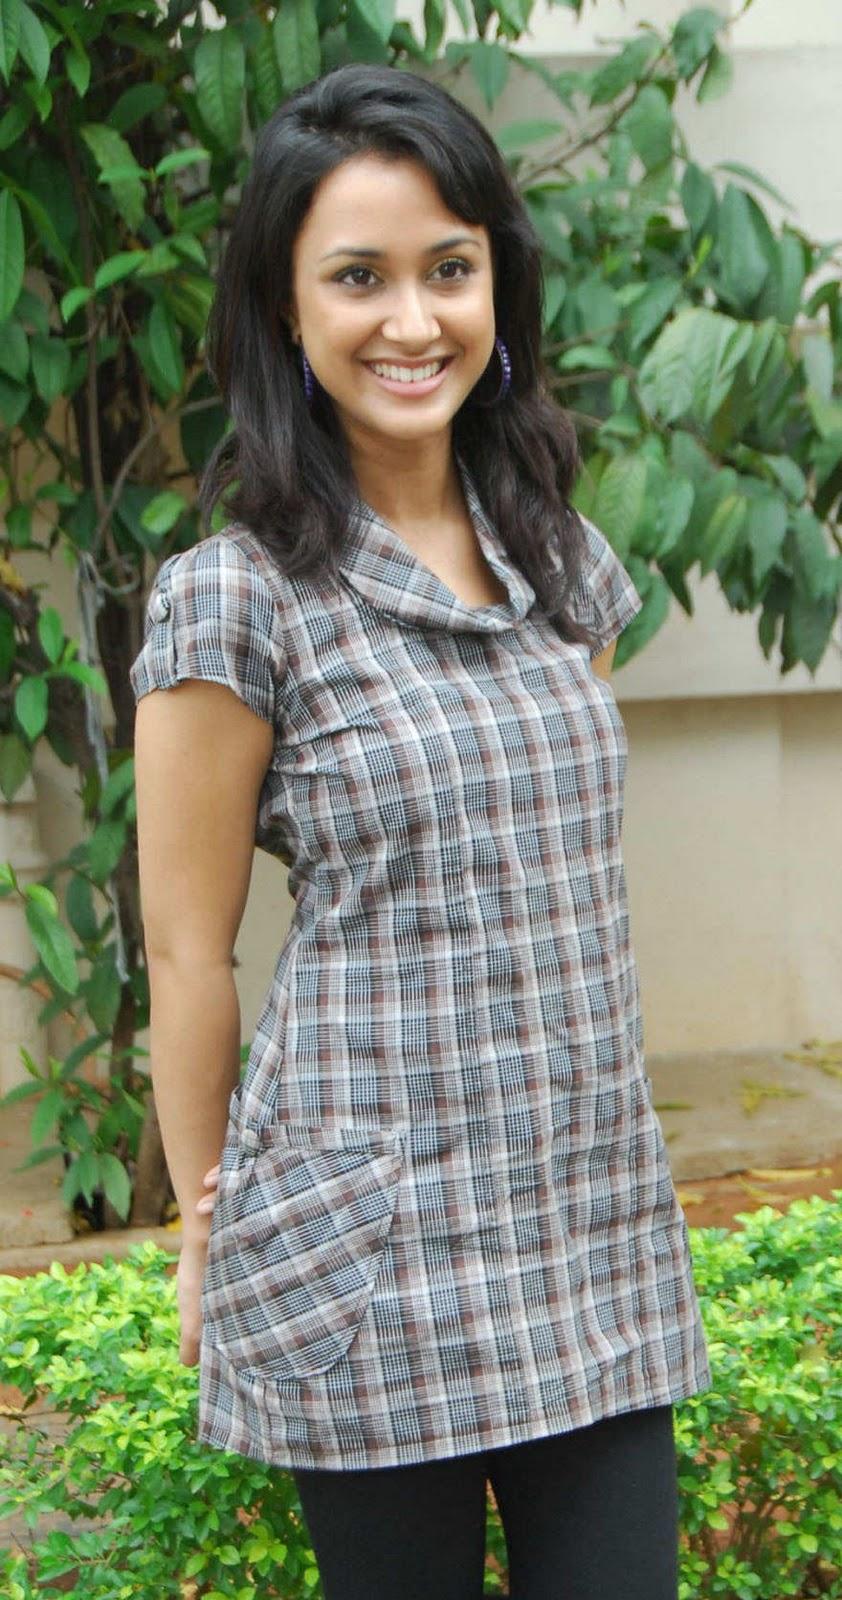 Suma Bhattacharya nudes (29 pics) Fappening, Facebook, cleavage